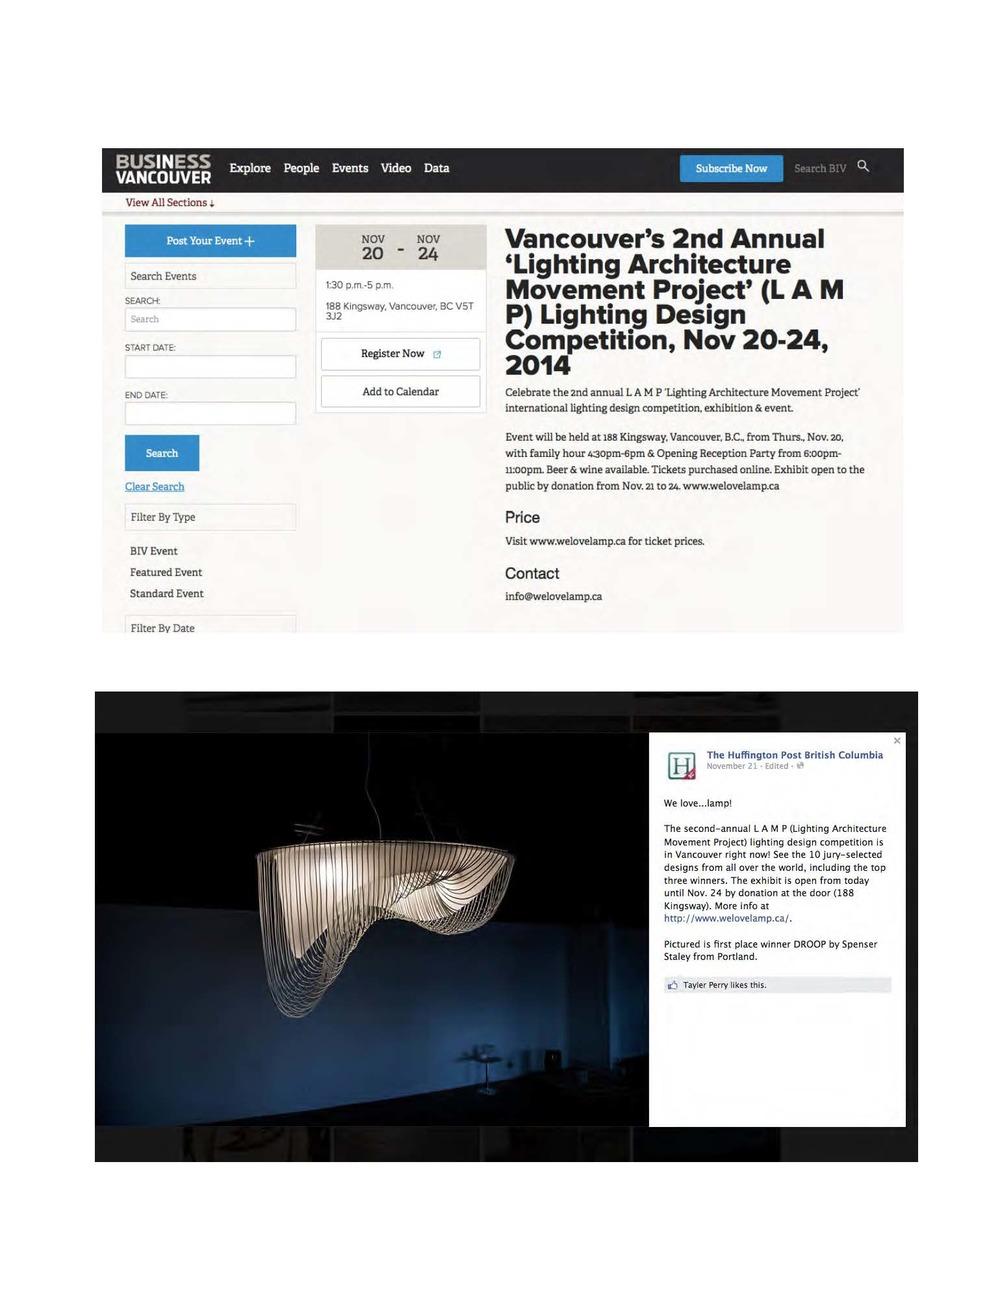 LAMP 2014 Press Kit_Page_20.jpg